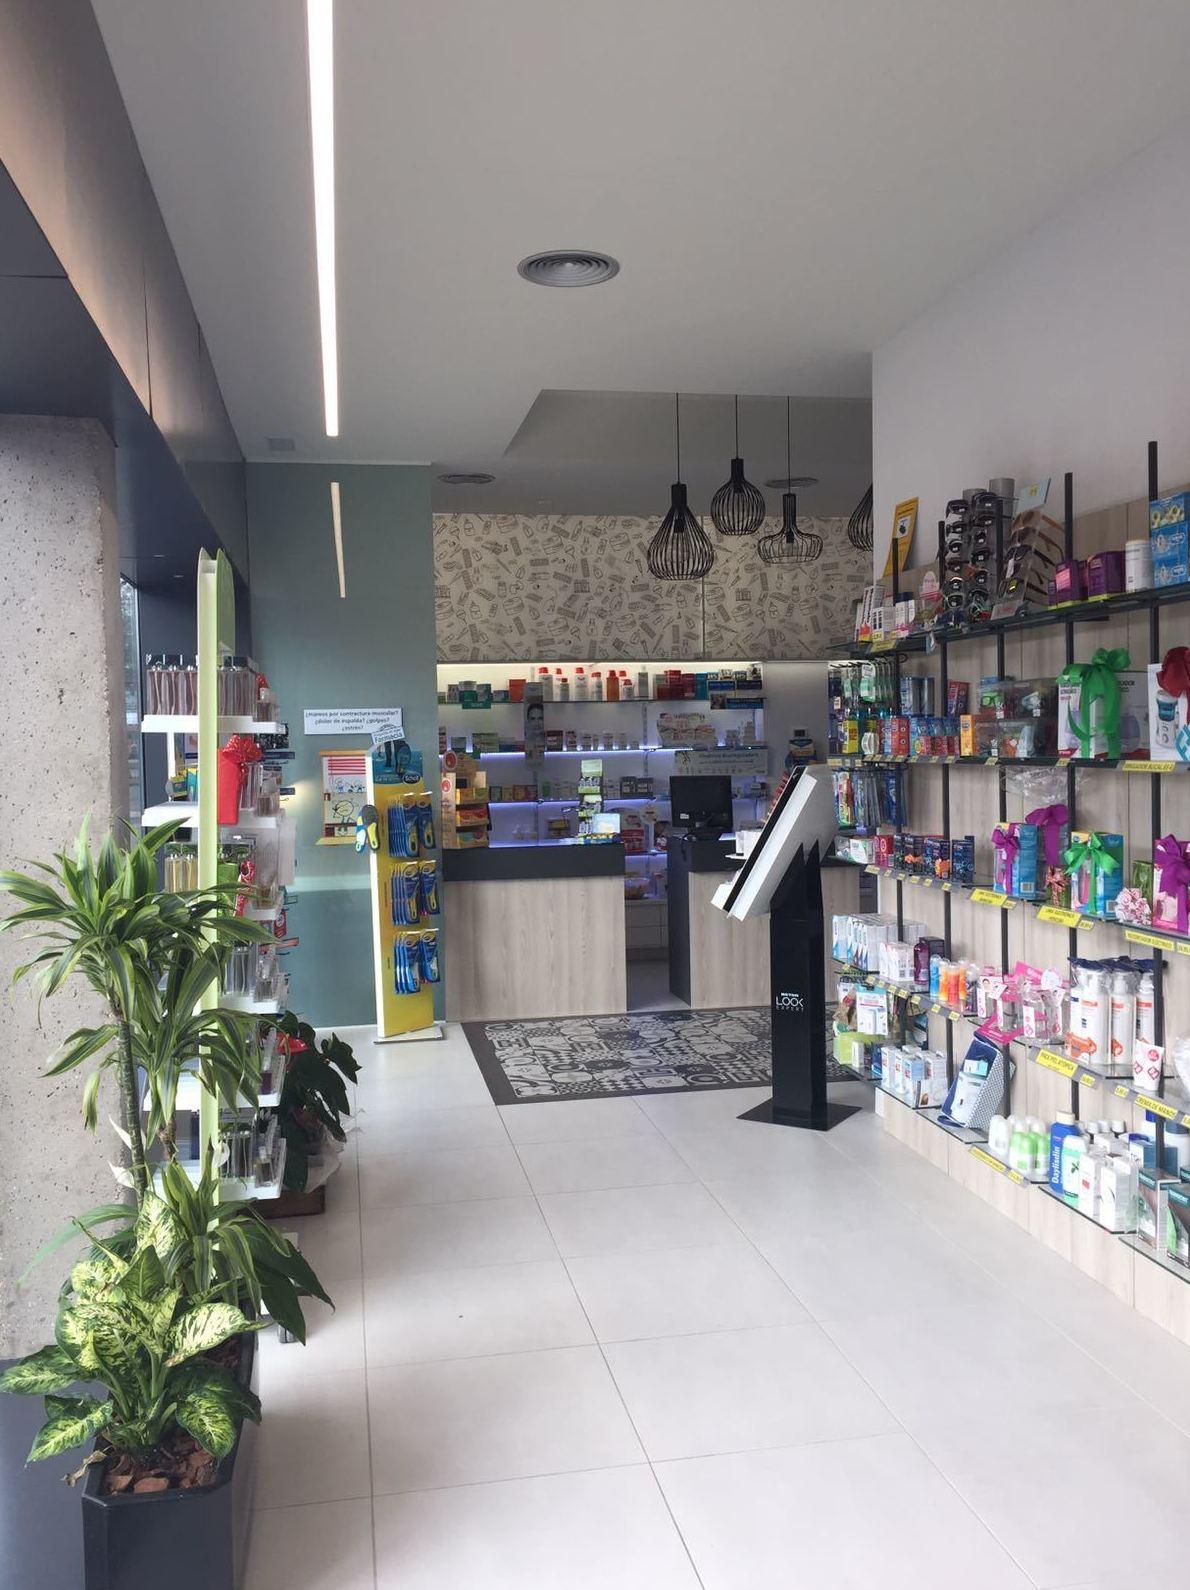 Foto 4 de Farmacias en Burgos | Farmacia Margarita Medrano Ruiz